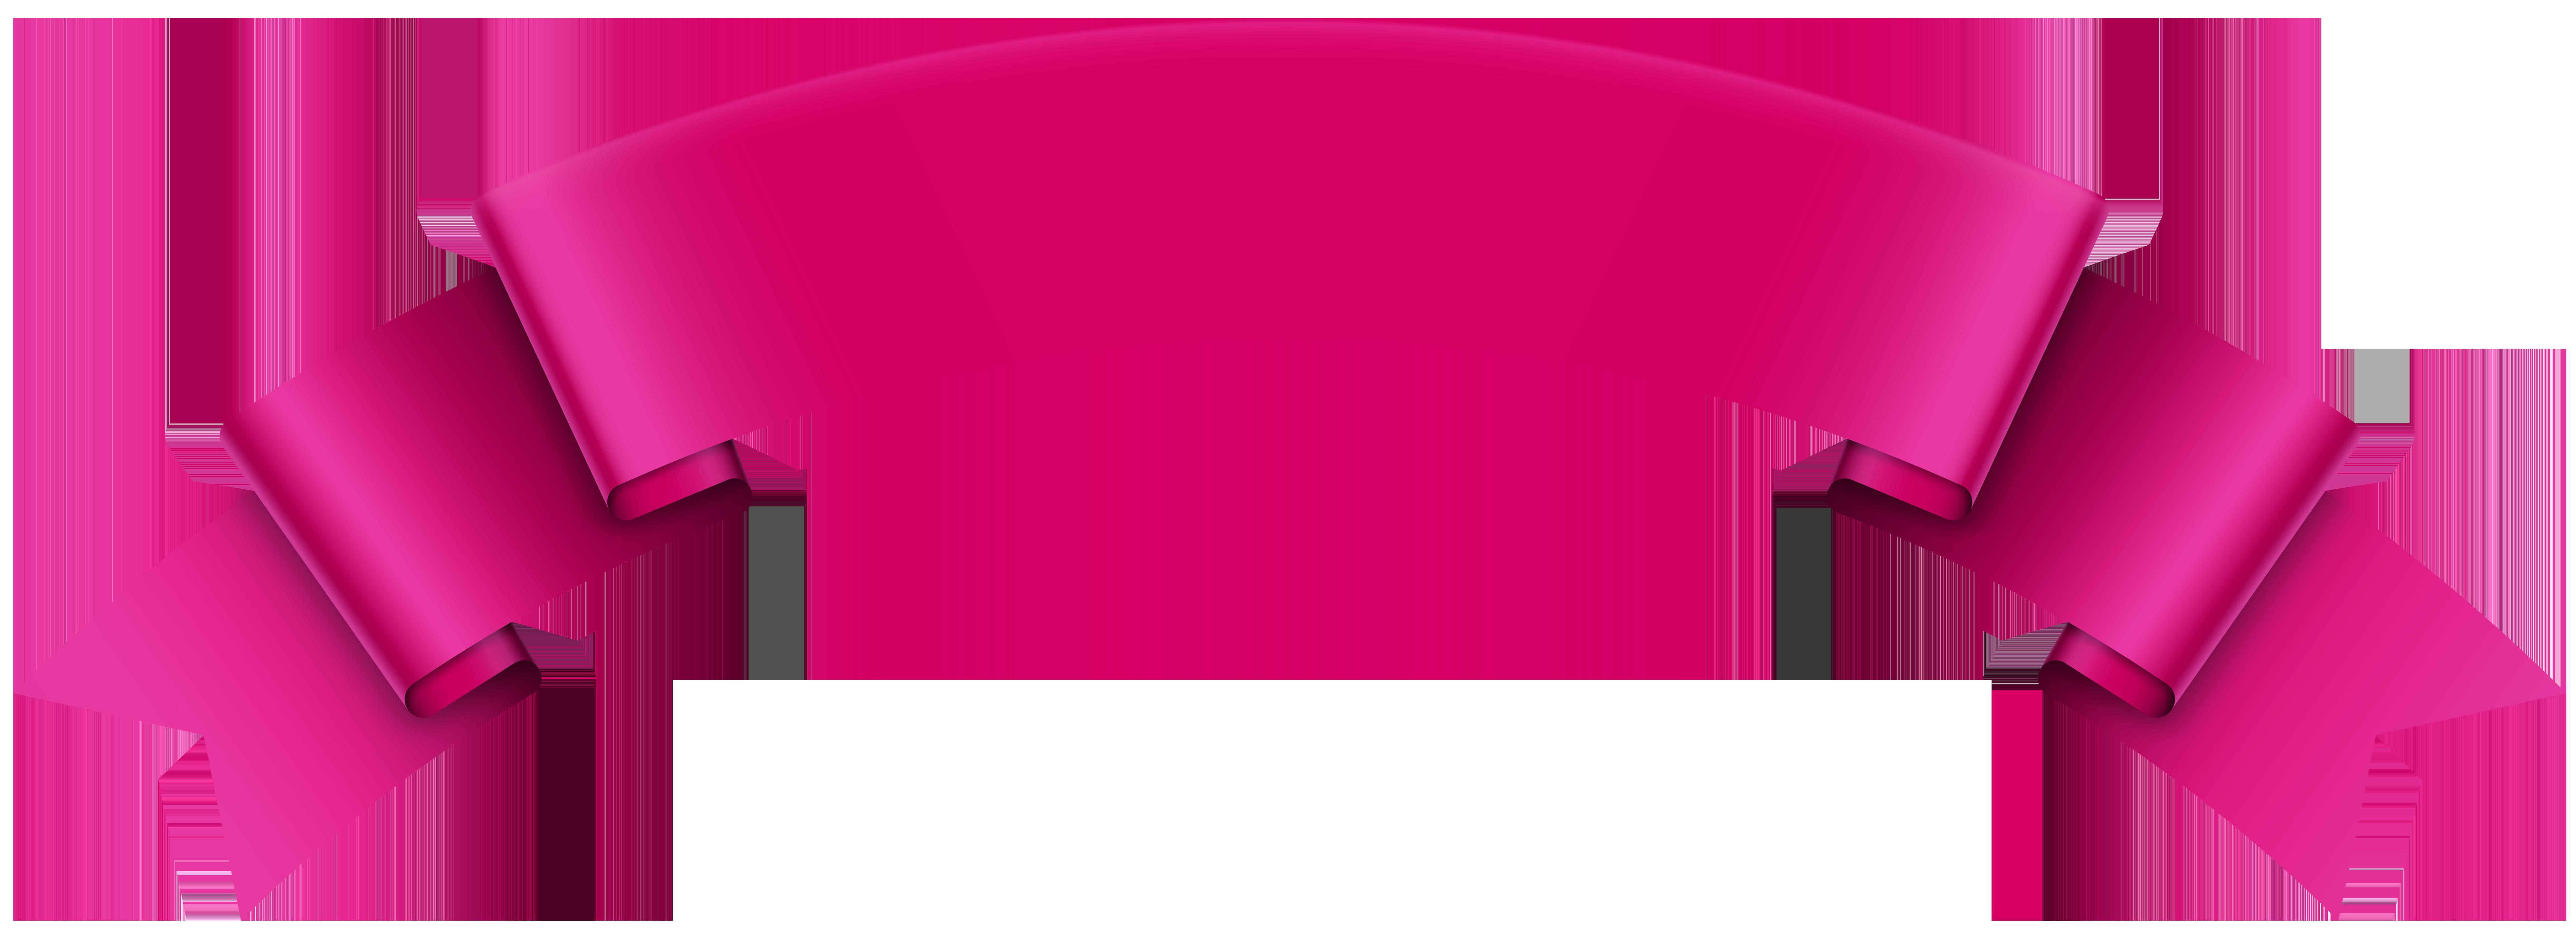 Banner transparent png clip. Instruments clipart pink